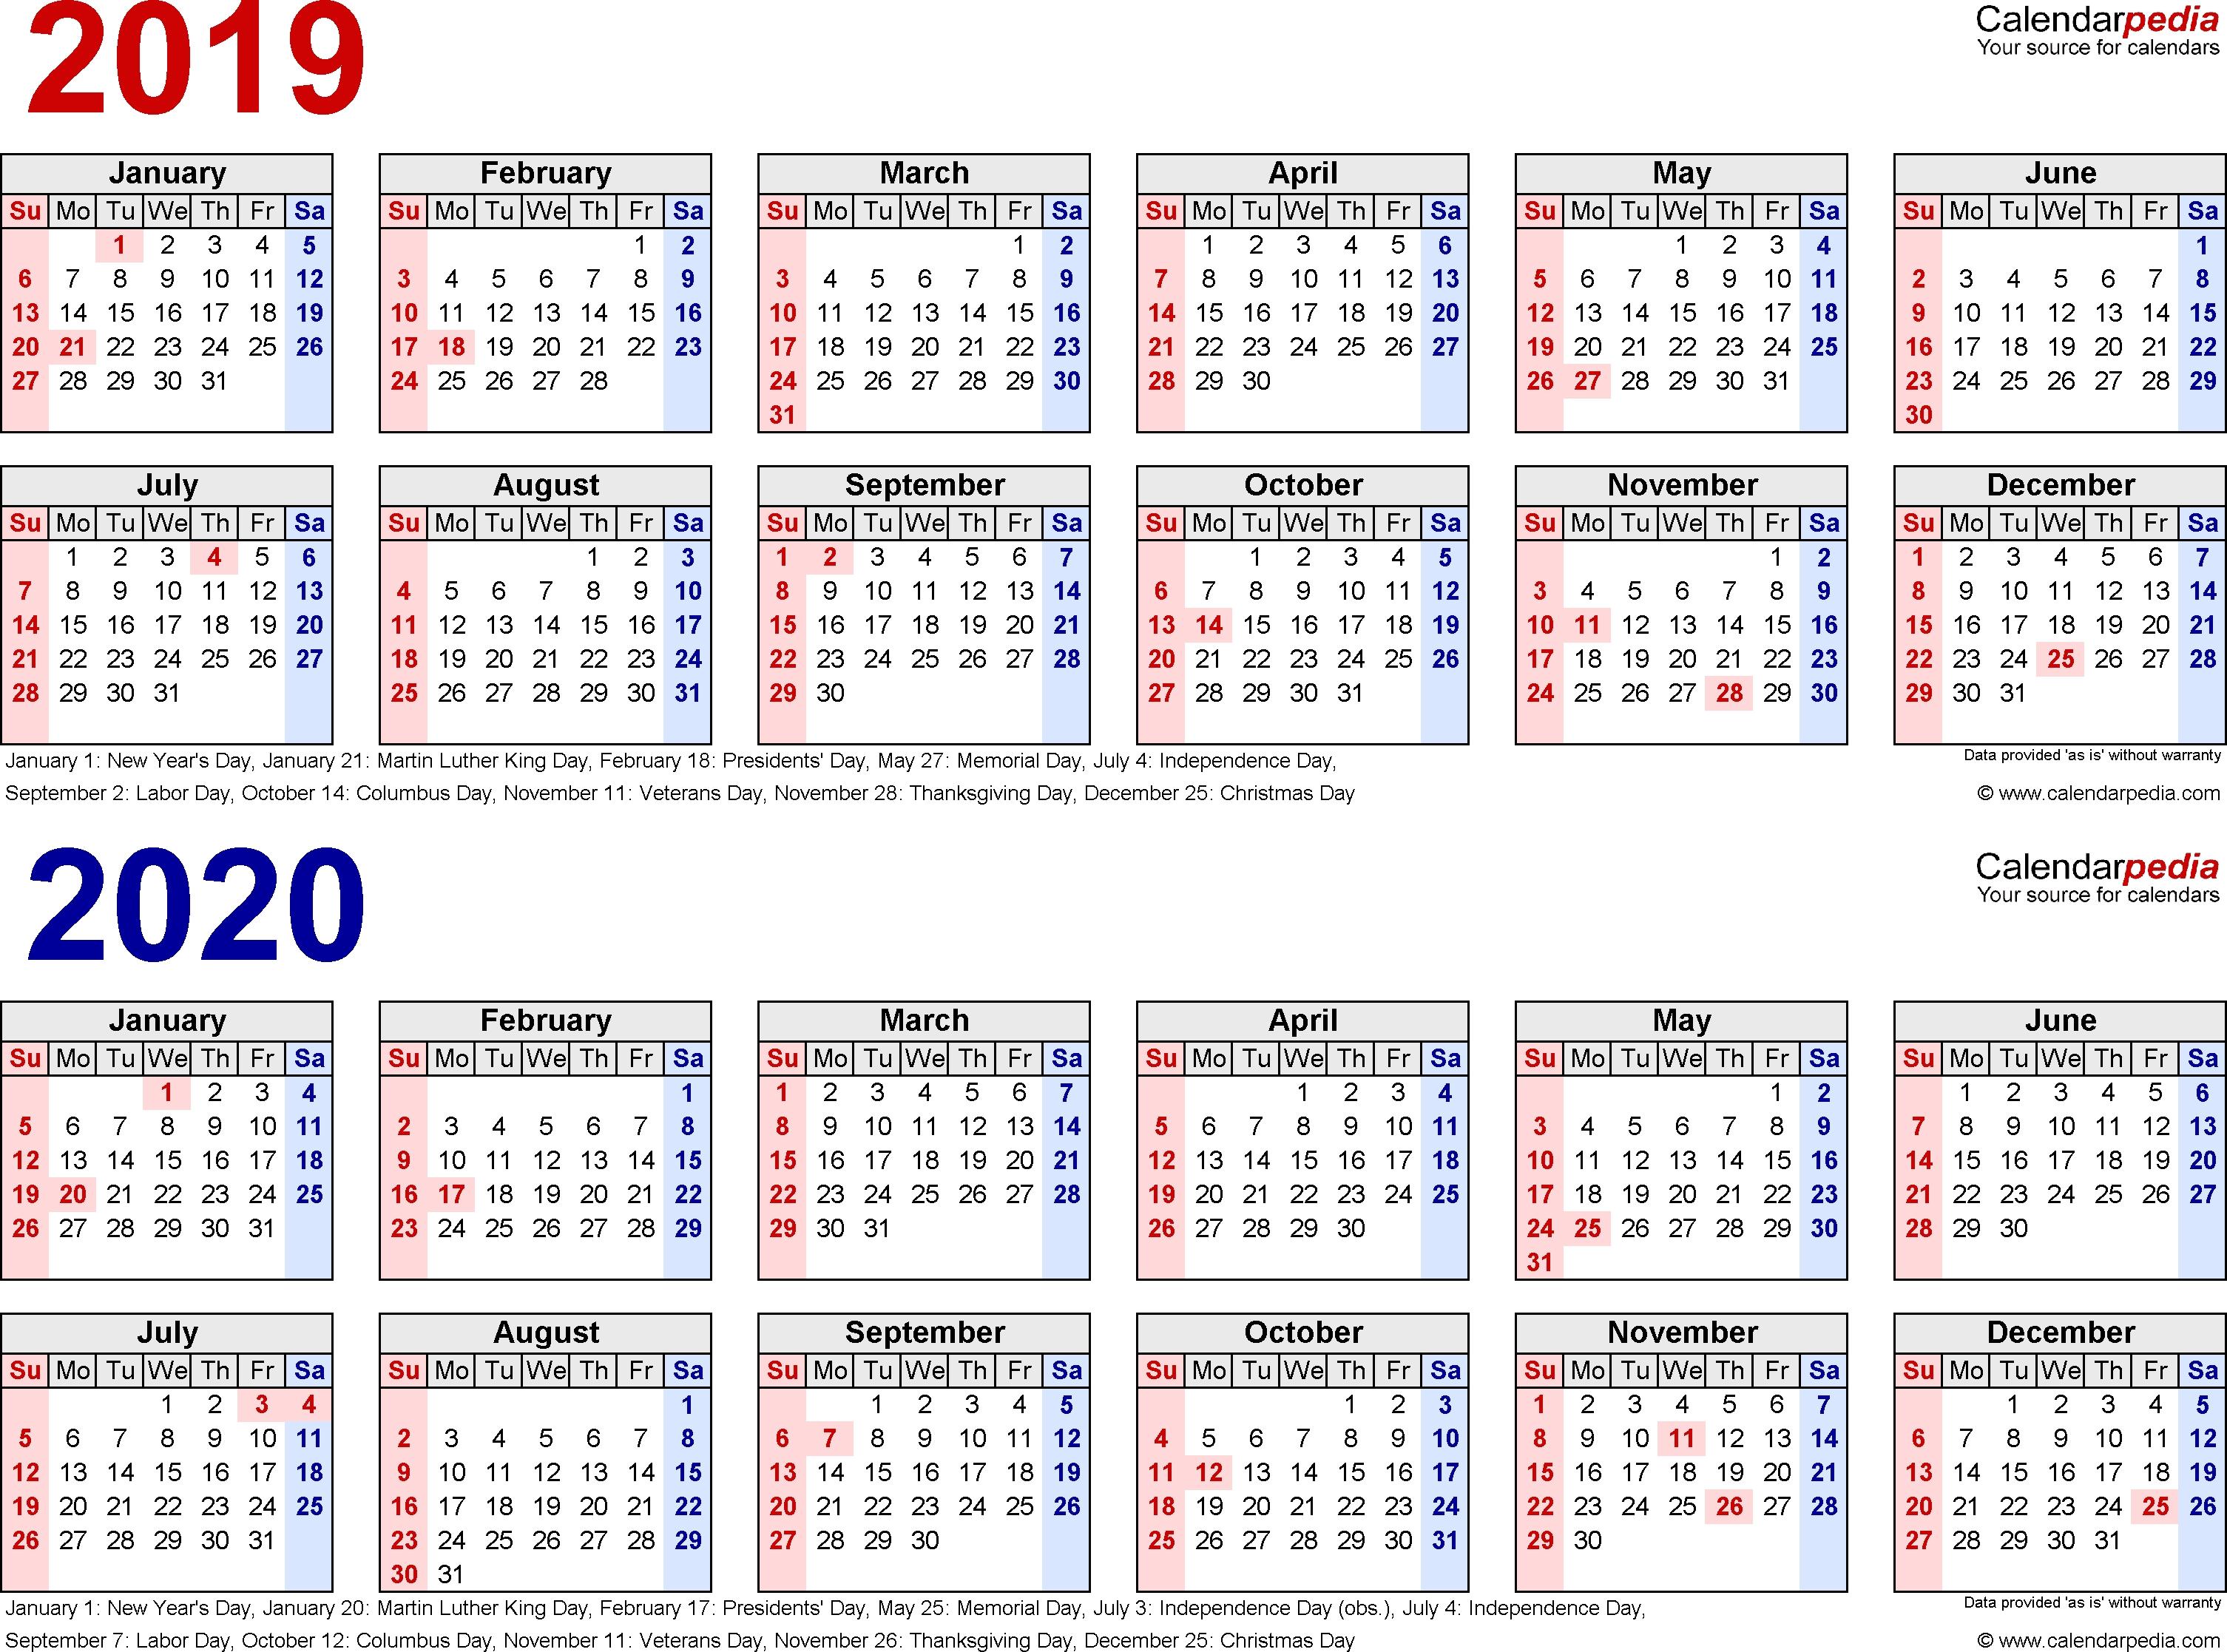 2019-2020 Calendar - Free Printable Two-Year Pdf Calendars with June 2019-June 2020 Yearly Calendar